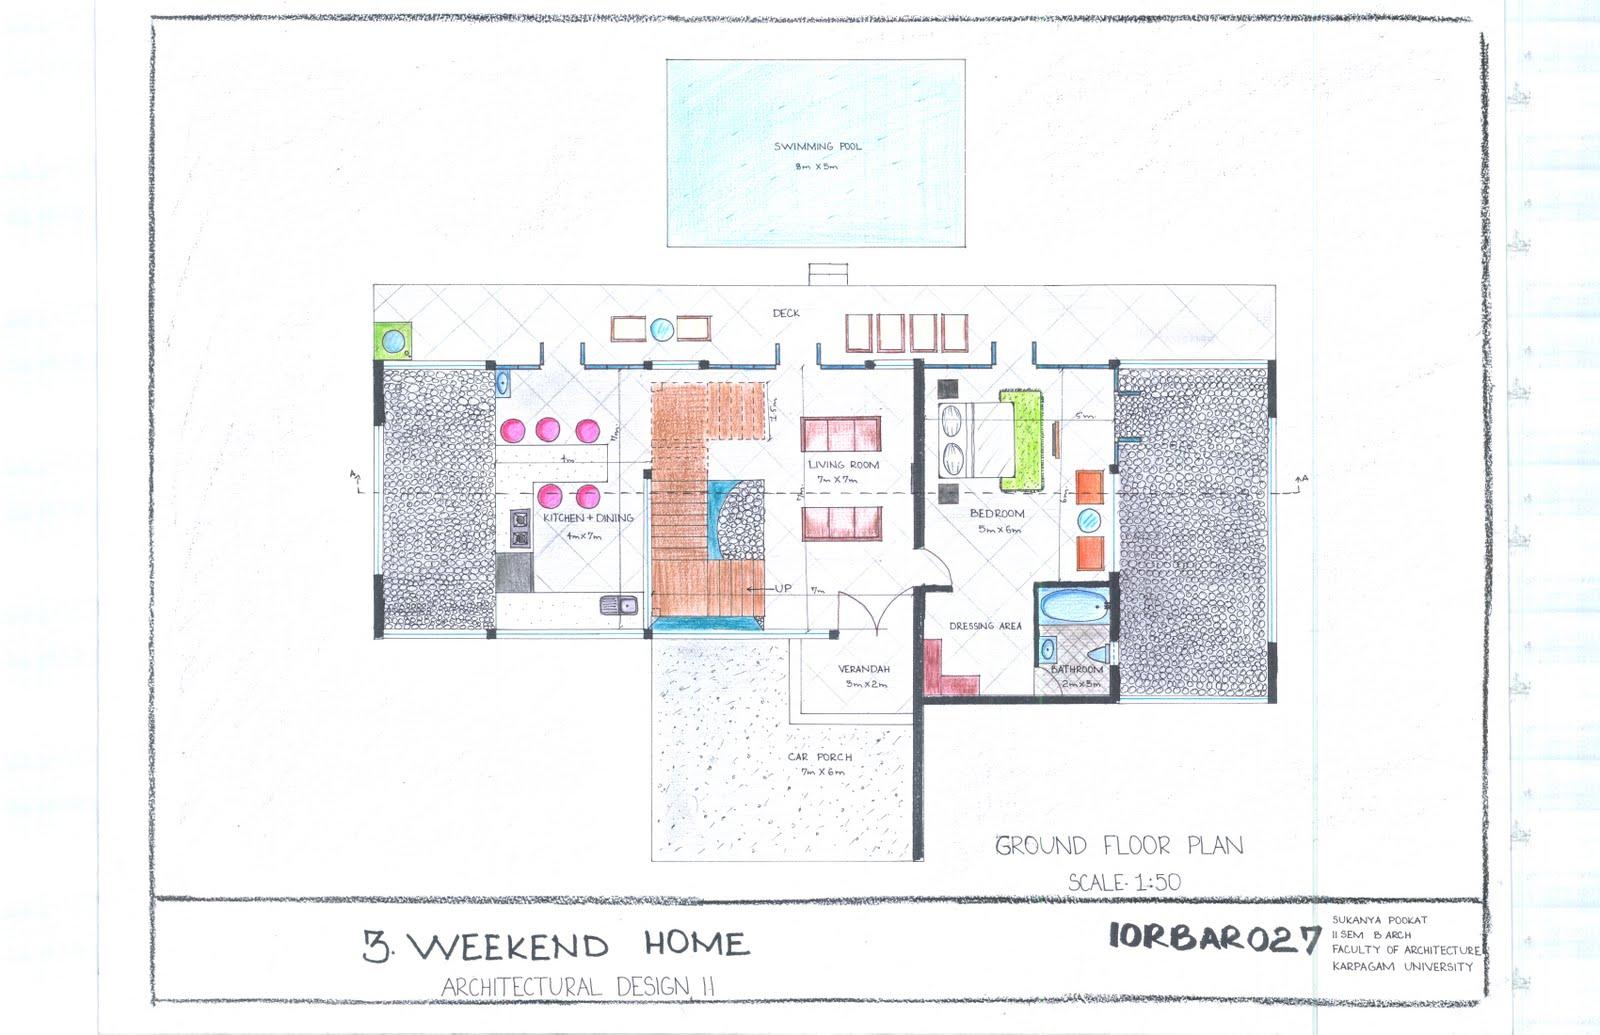 Weekend Home Design